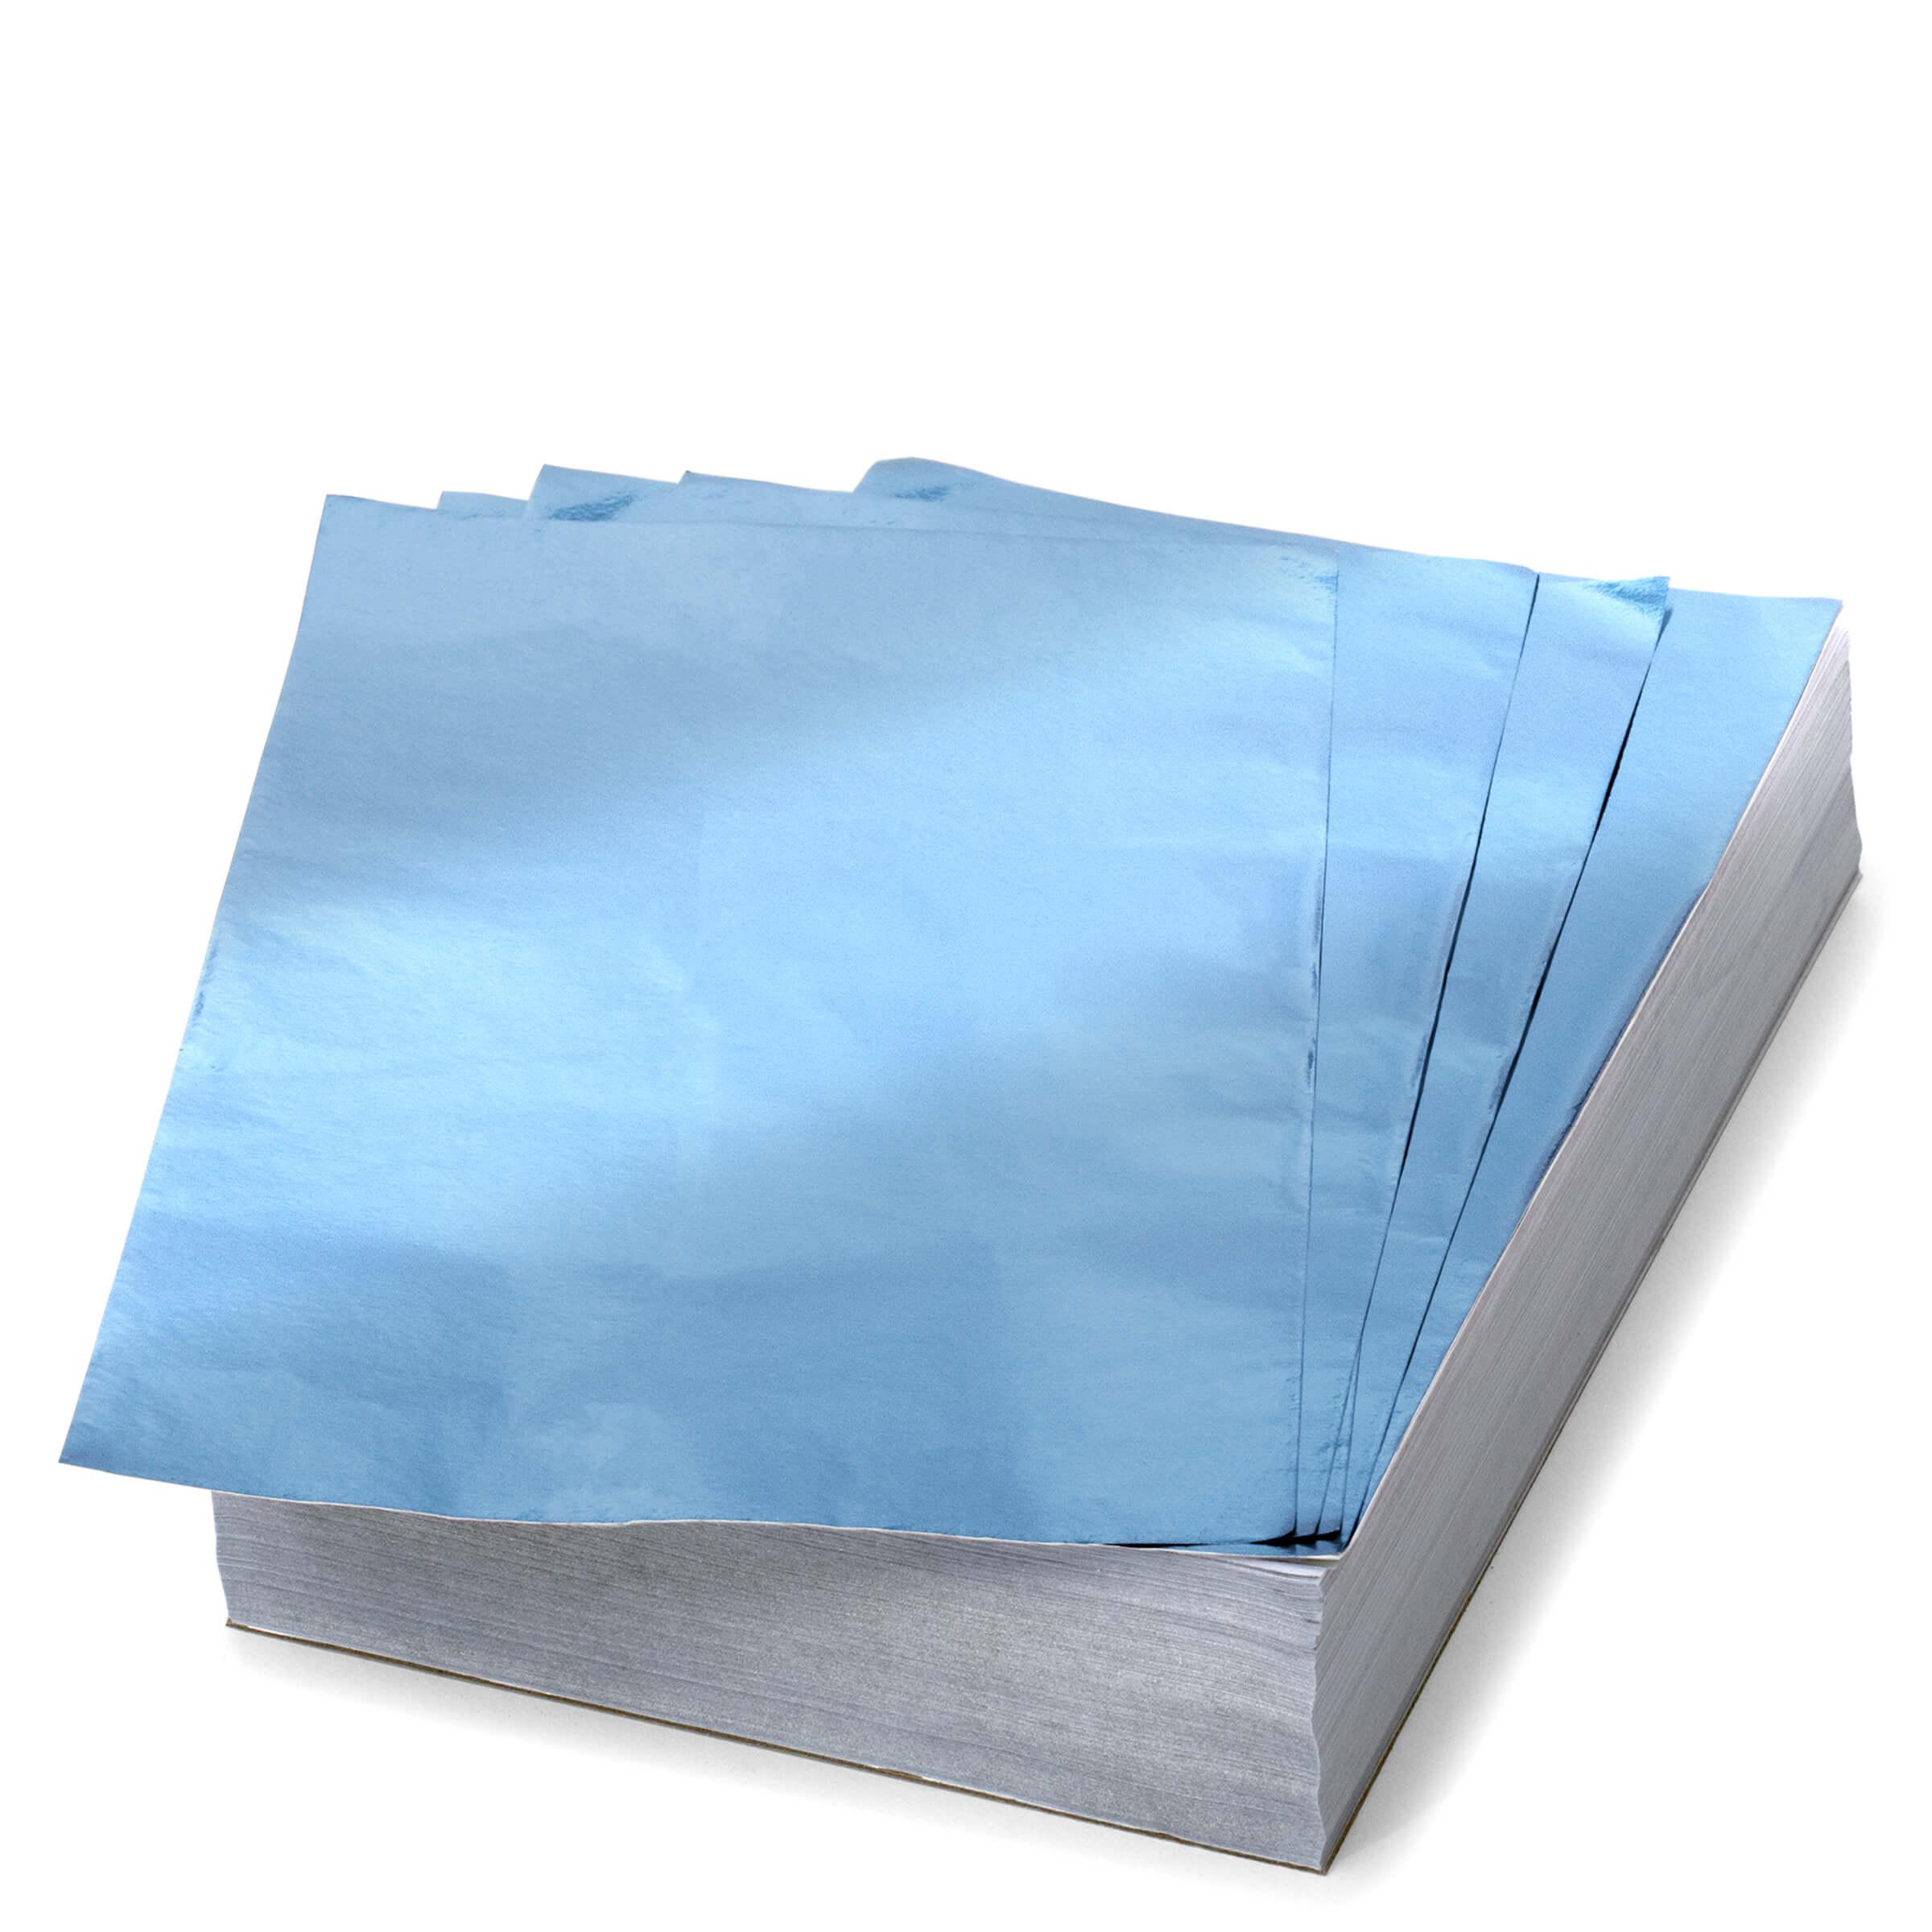 AL-58-45LB-a-5x8-smooth-foil-x-light-light-blue-l.jpg